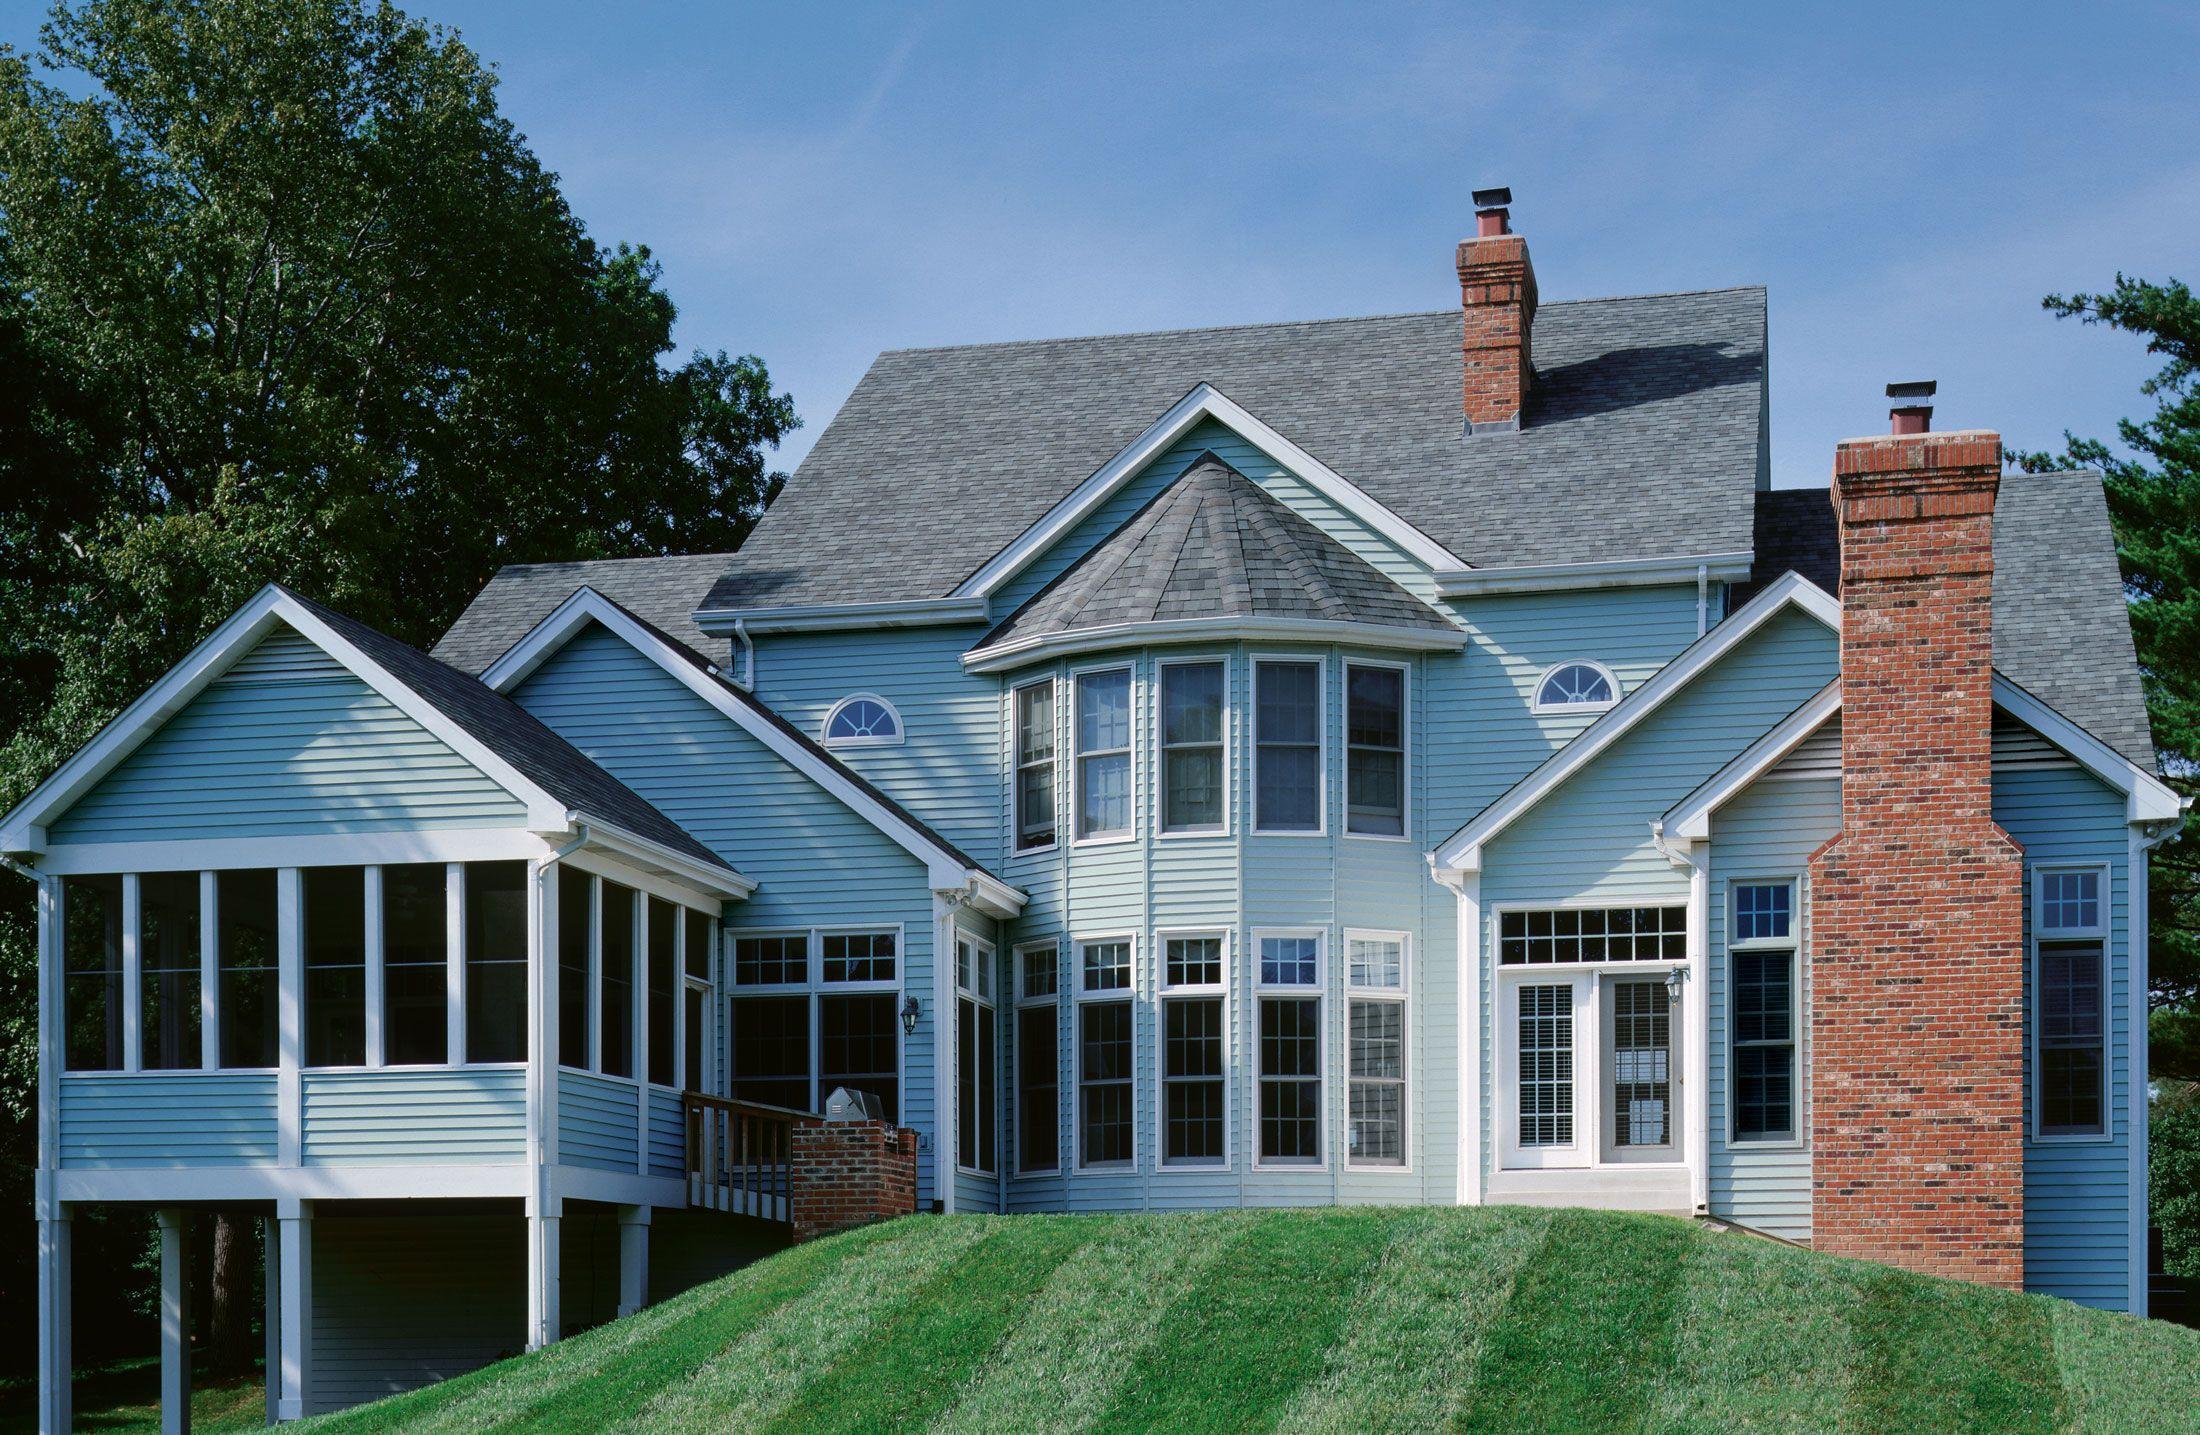 Oxford Blue Certainteed Photos Certainteed Com Blue Siding House Exterior Certainteed